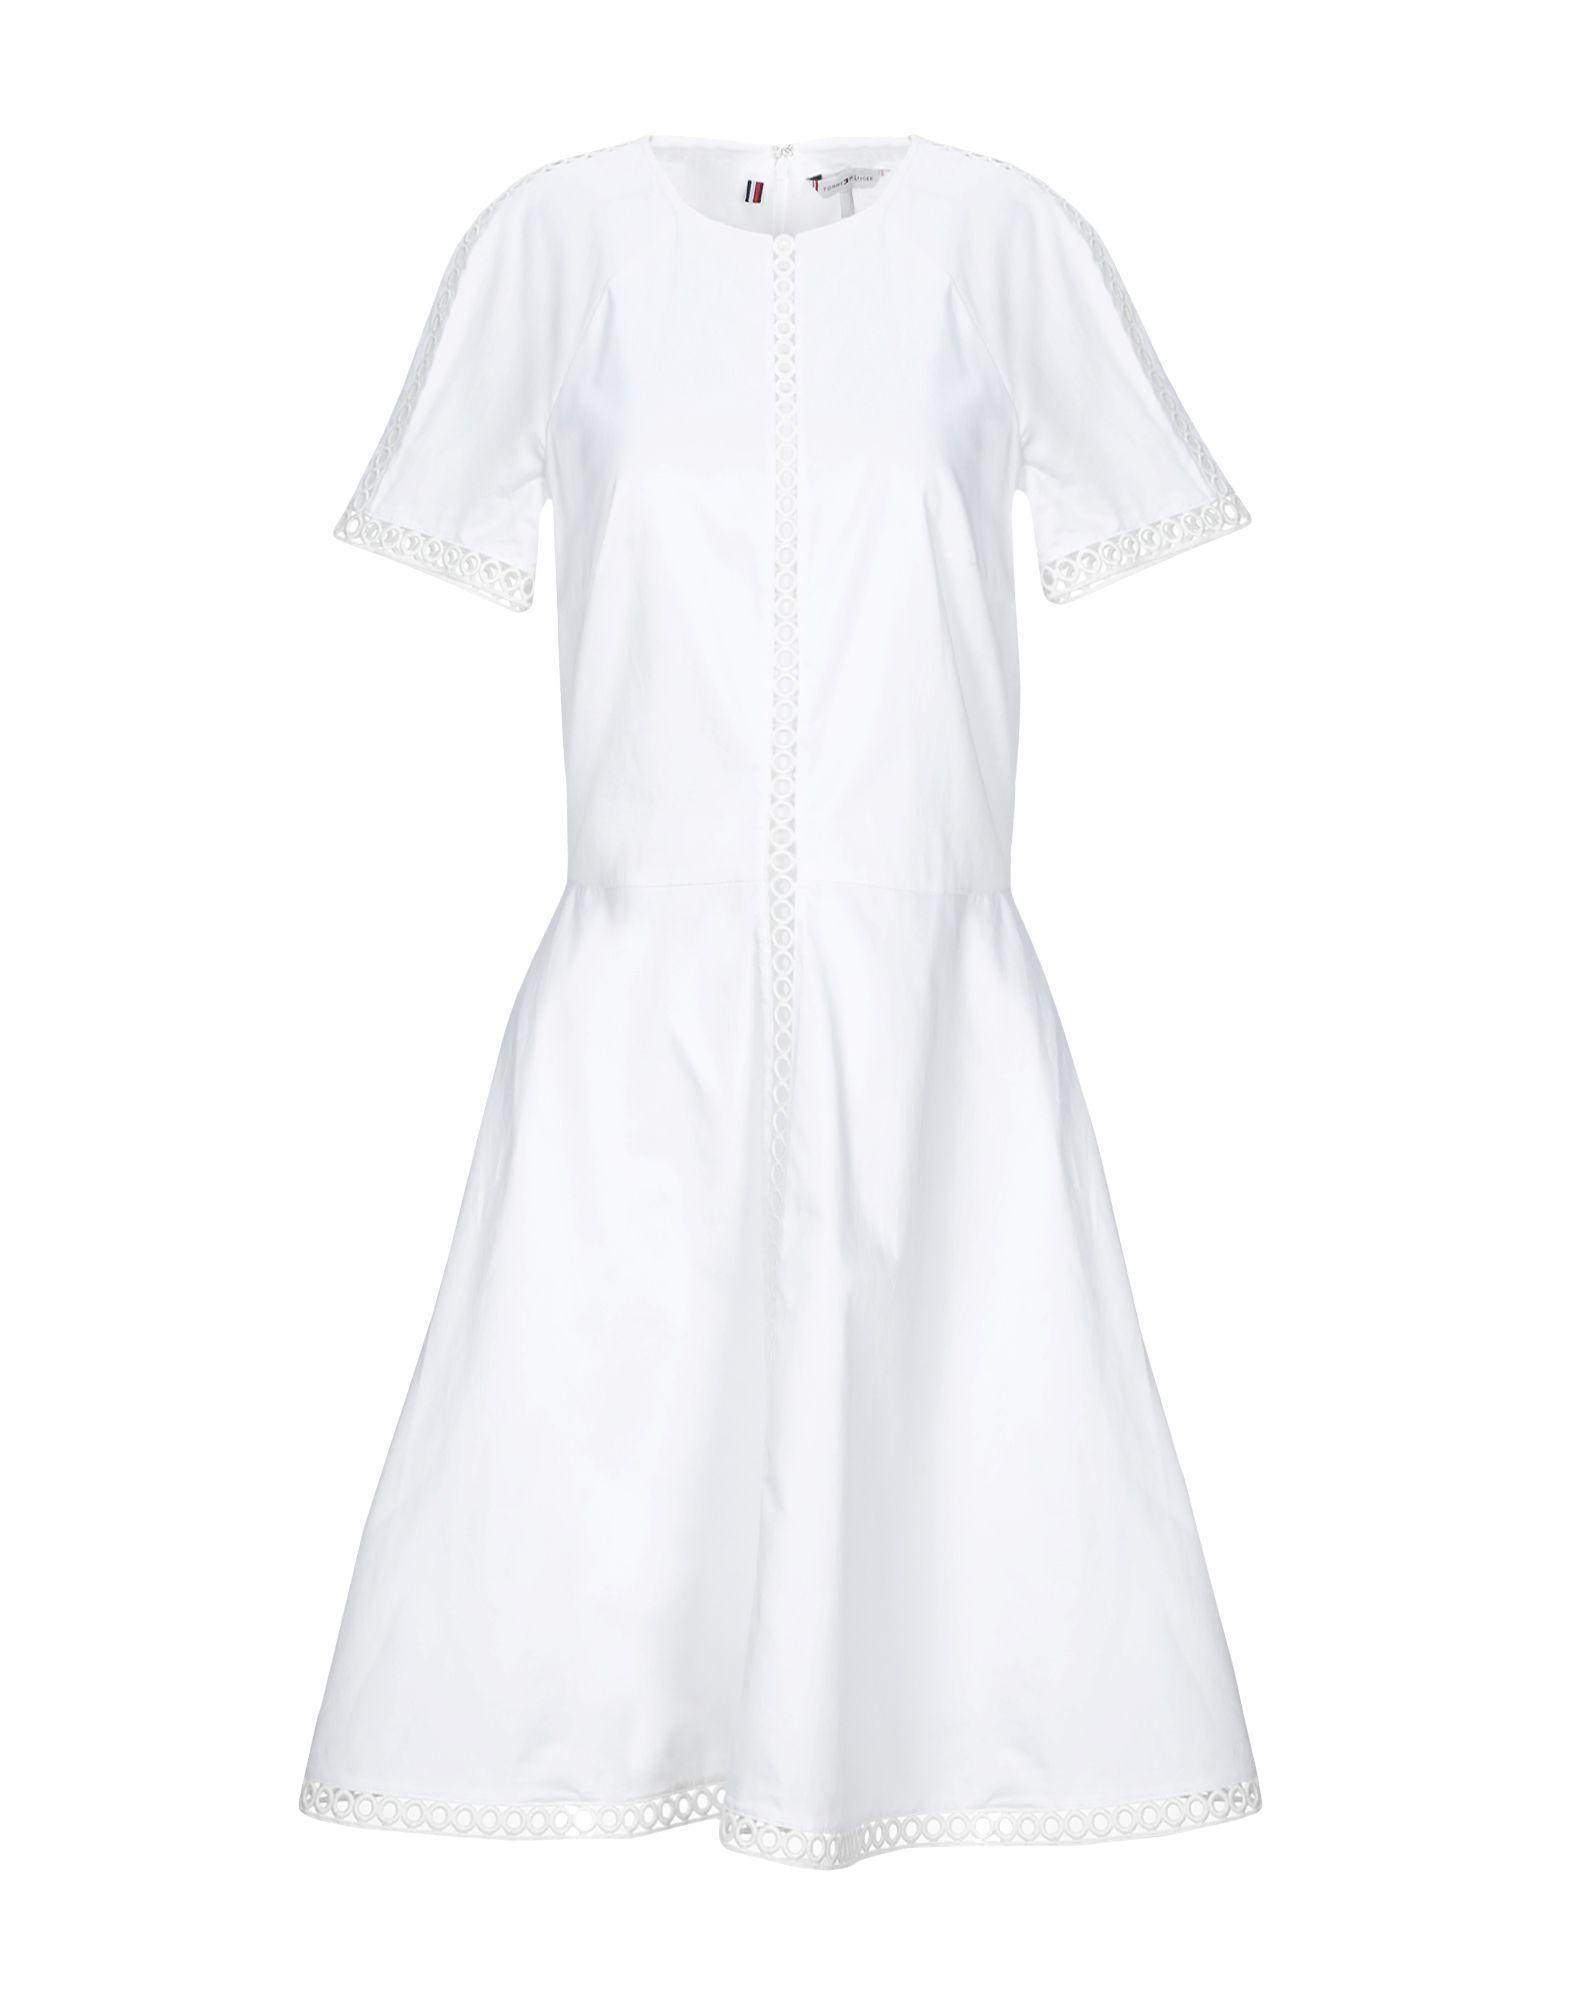 TOMMY HILFIGER Короткое платье платье с круглой горловиной на завязках tommy hilfiger